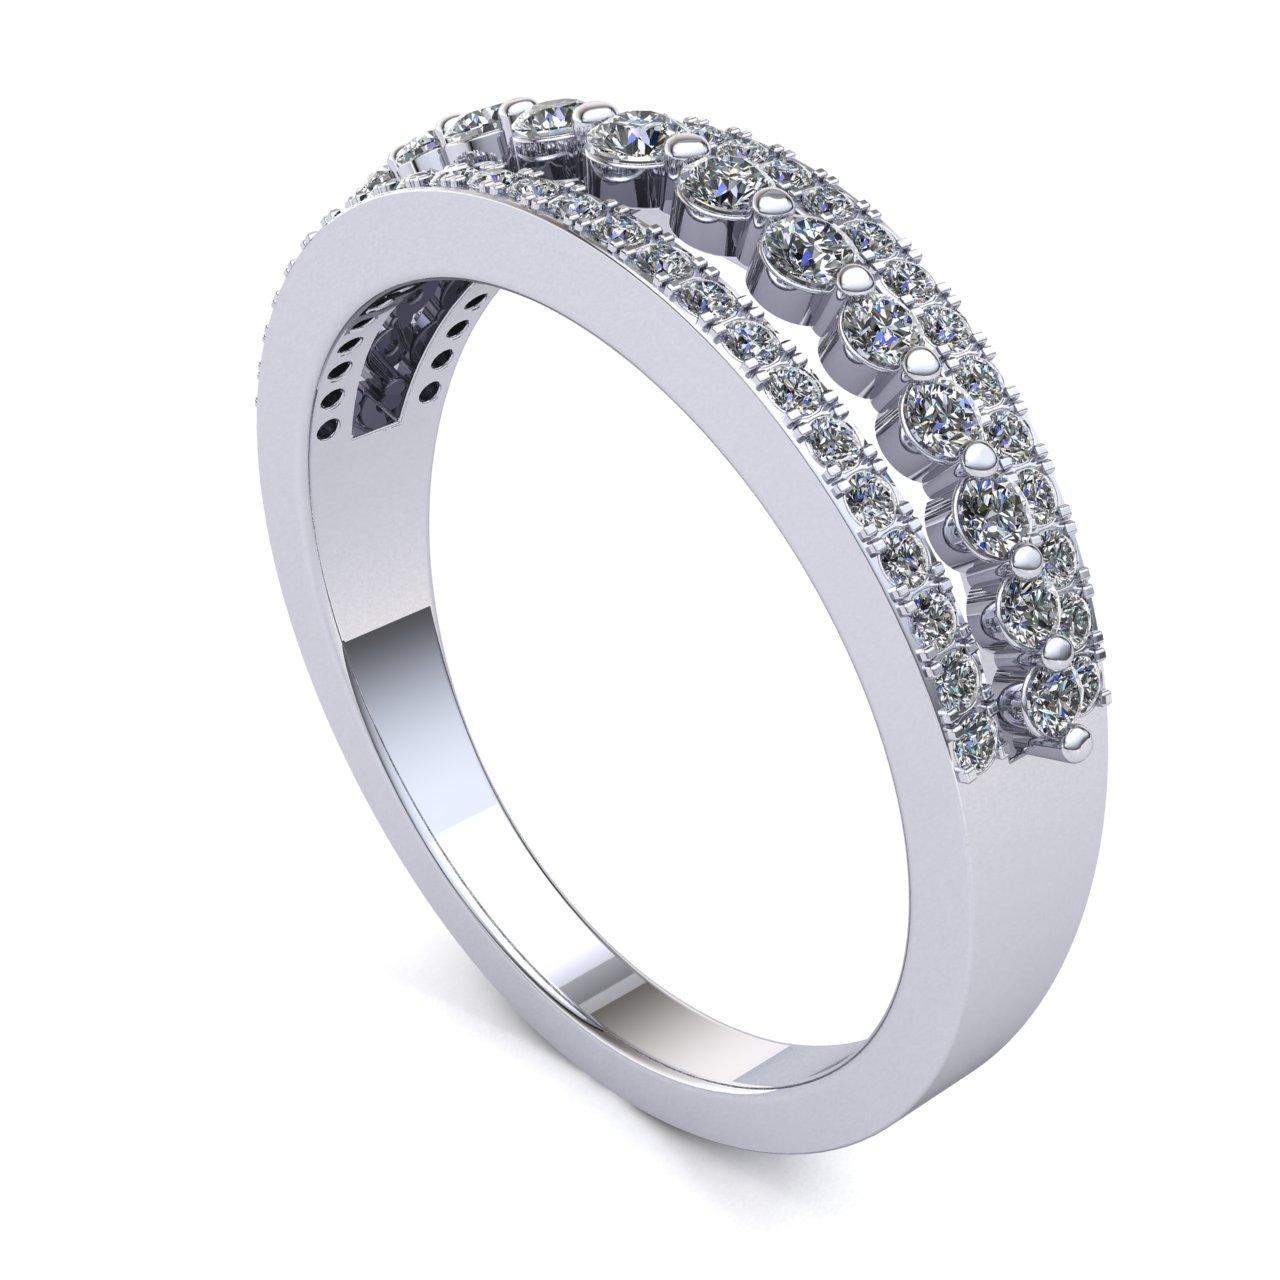 Genuine-0-5ctw-Round-Cut-Diamond-Ladies-Accent-Anniversary-Wedding-Band-10K-Gold thumbnail 10